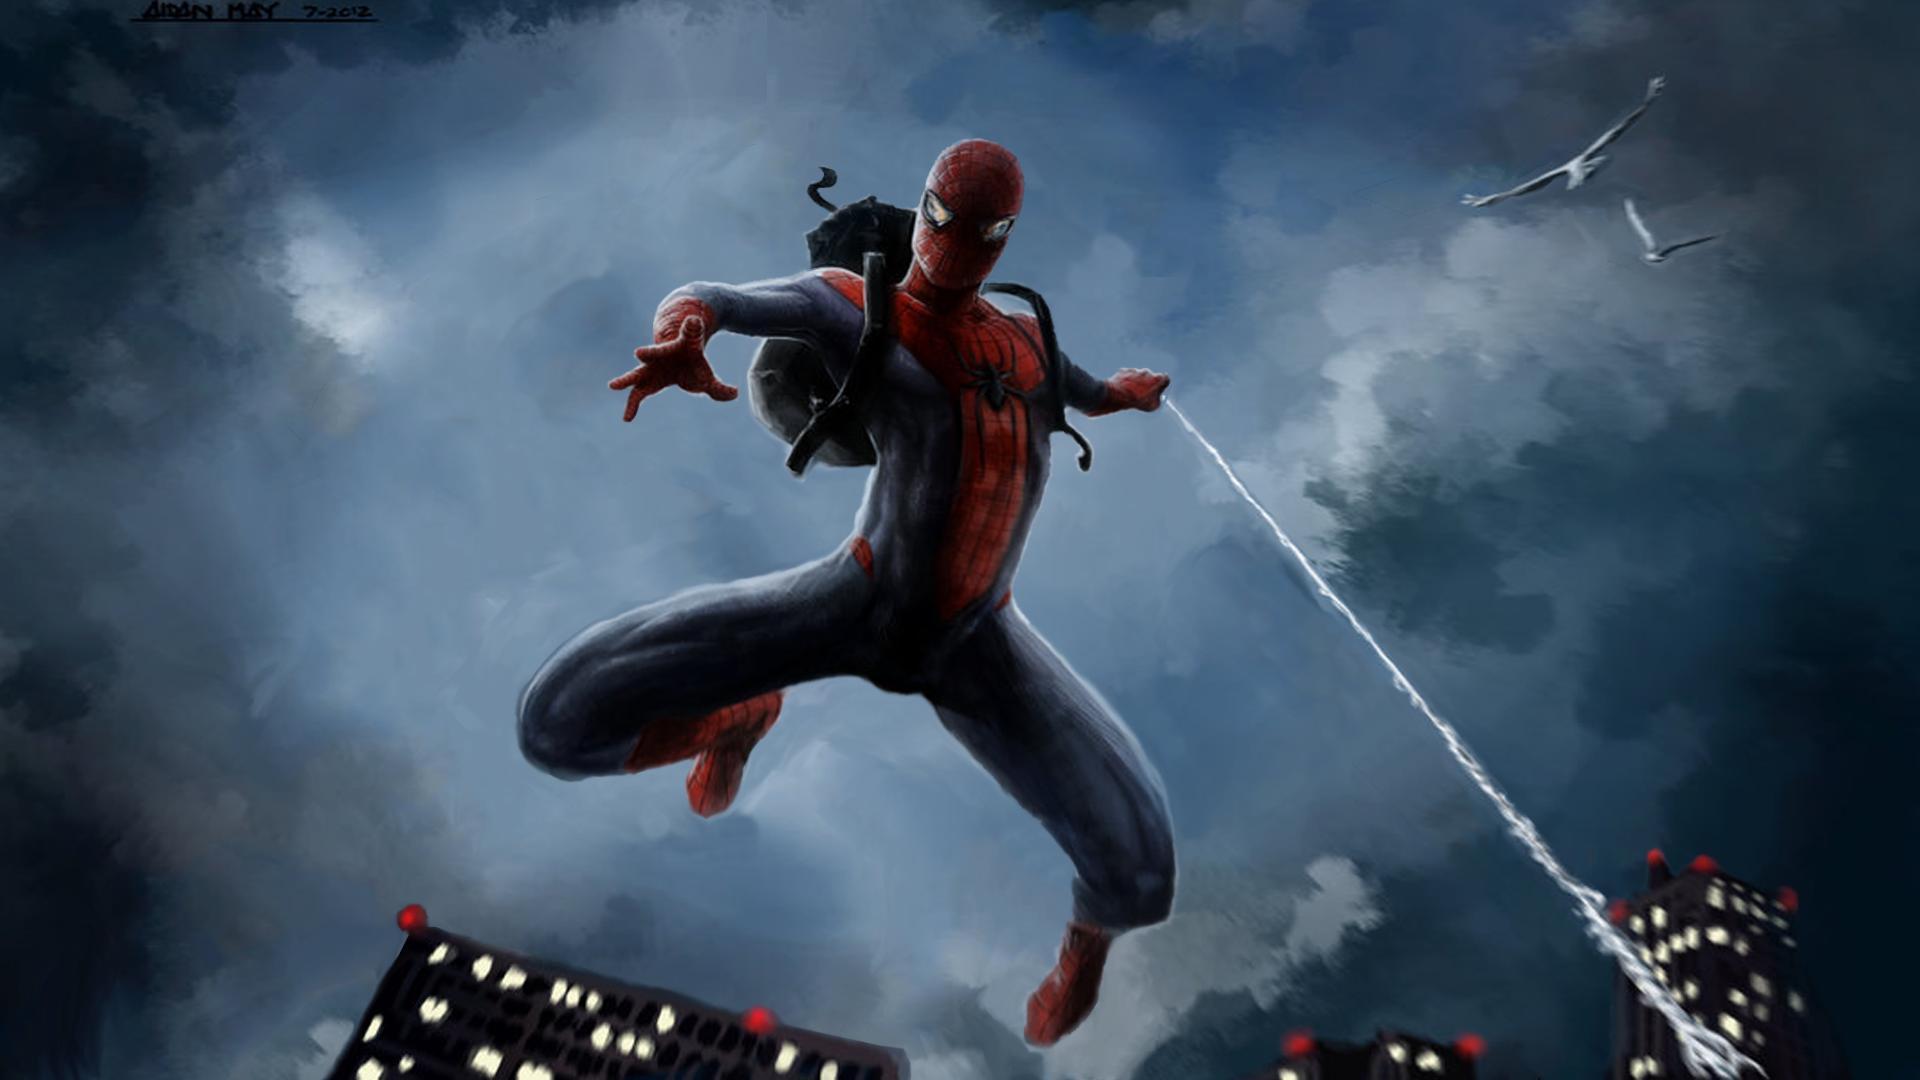 40 Amazing Spiderman Wallpaper HD for PC 1920x1080